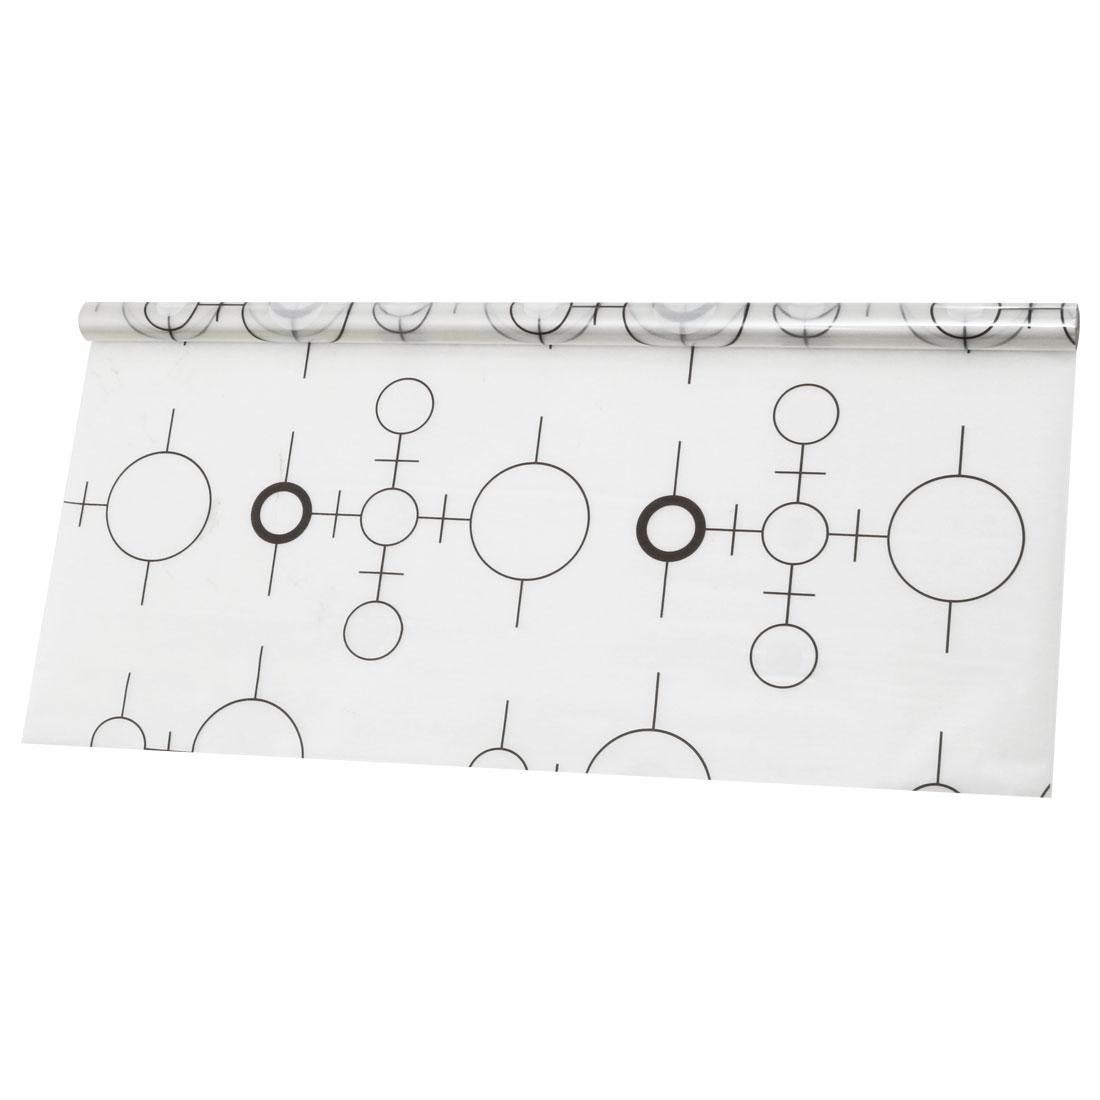 PVC 78.7 x 17.7 Inch Anti UV Window Film Sticker Black and White Circle